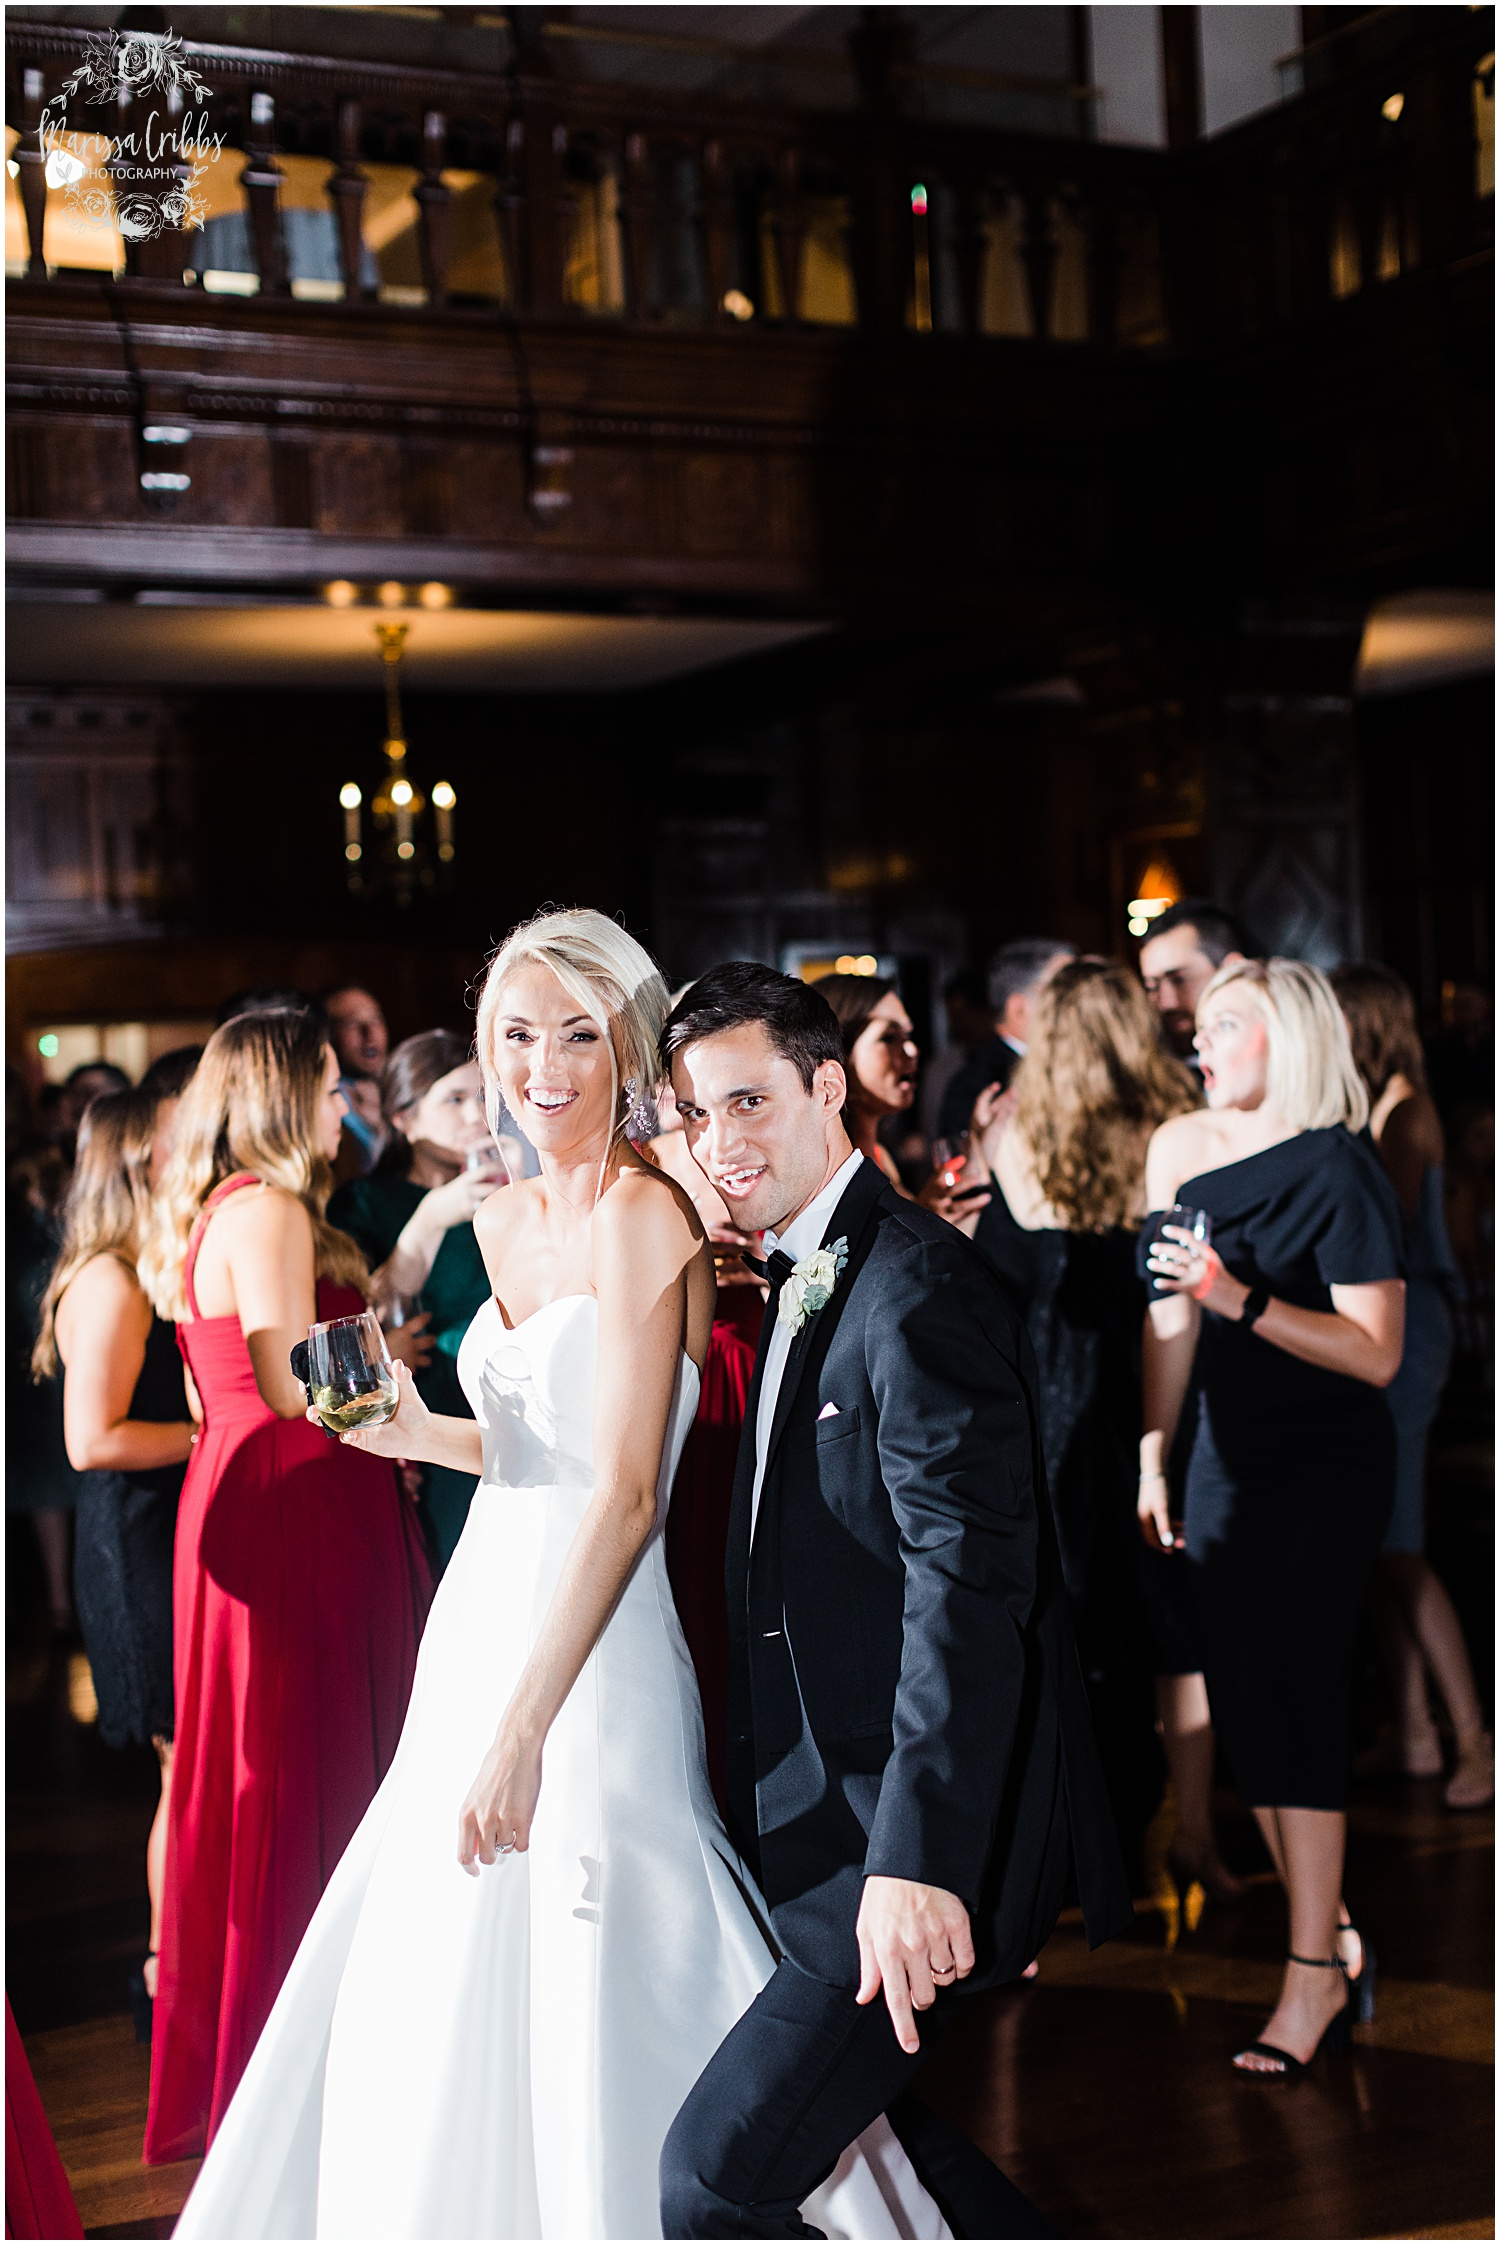 NOLL WEDDING | THE BRASS ON BALTIMORE | MARISSA CRIBBS PHOTOGRAPHY_6389.jpg